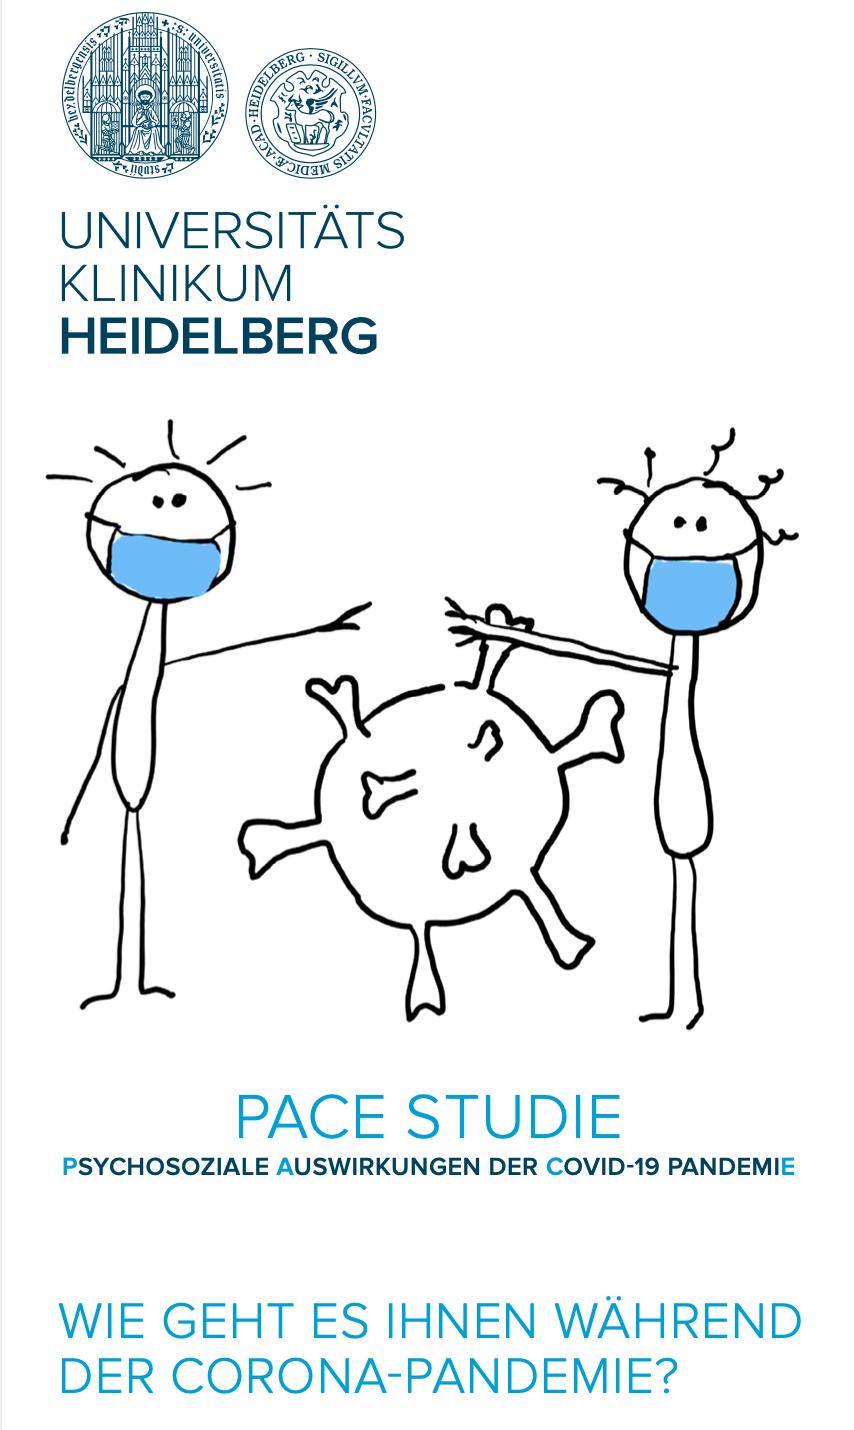 Studie Heidelberg Corona